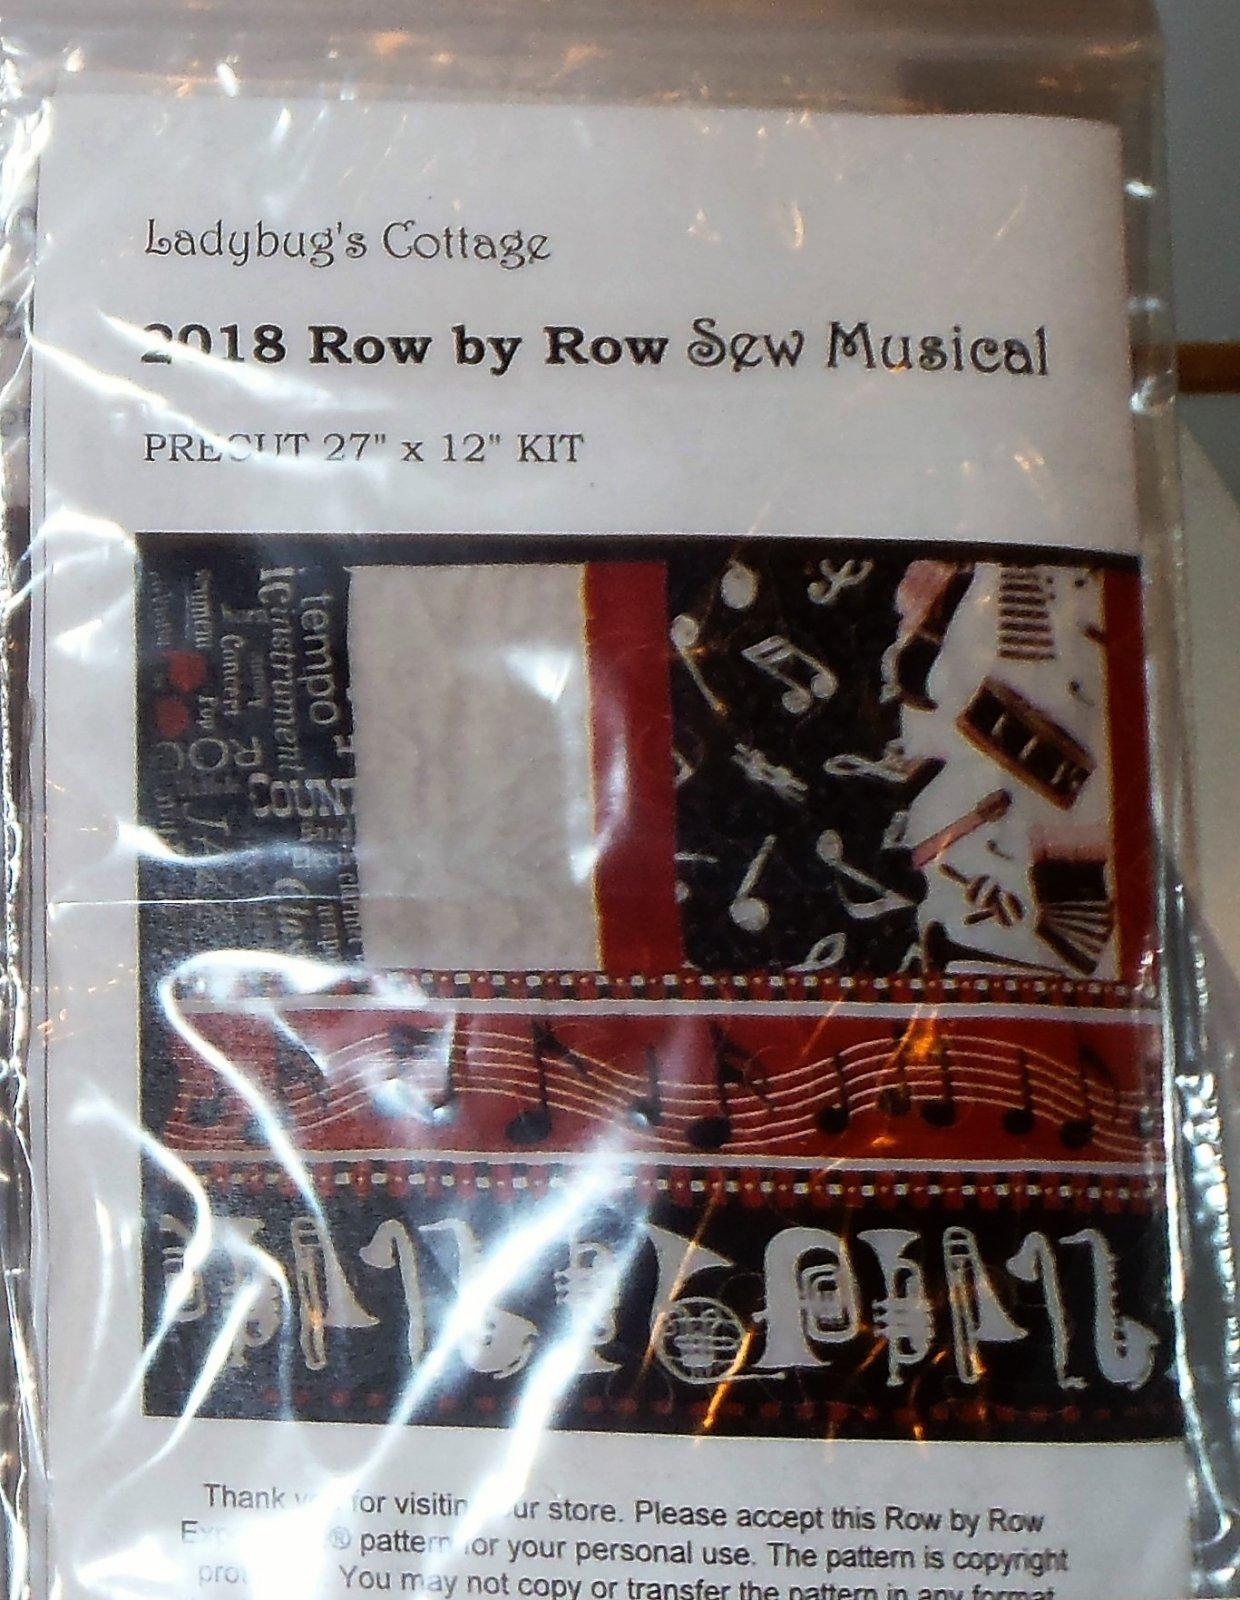 2018 Row by Row Sew Musical Kit